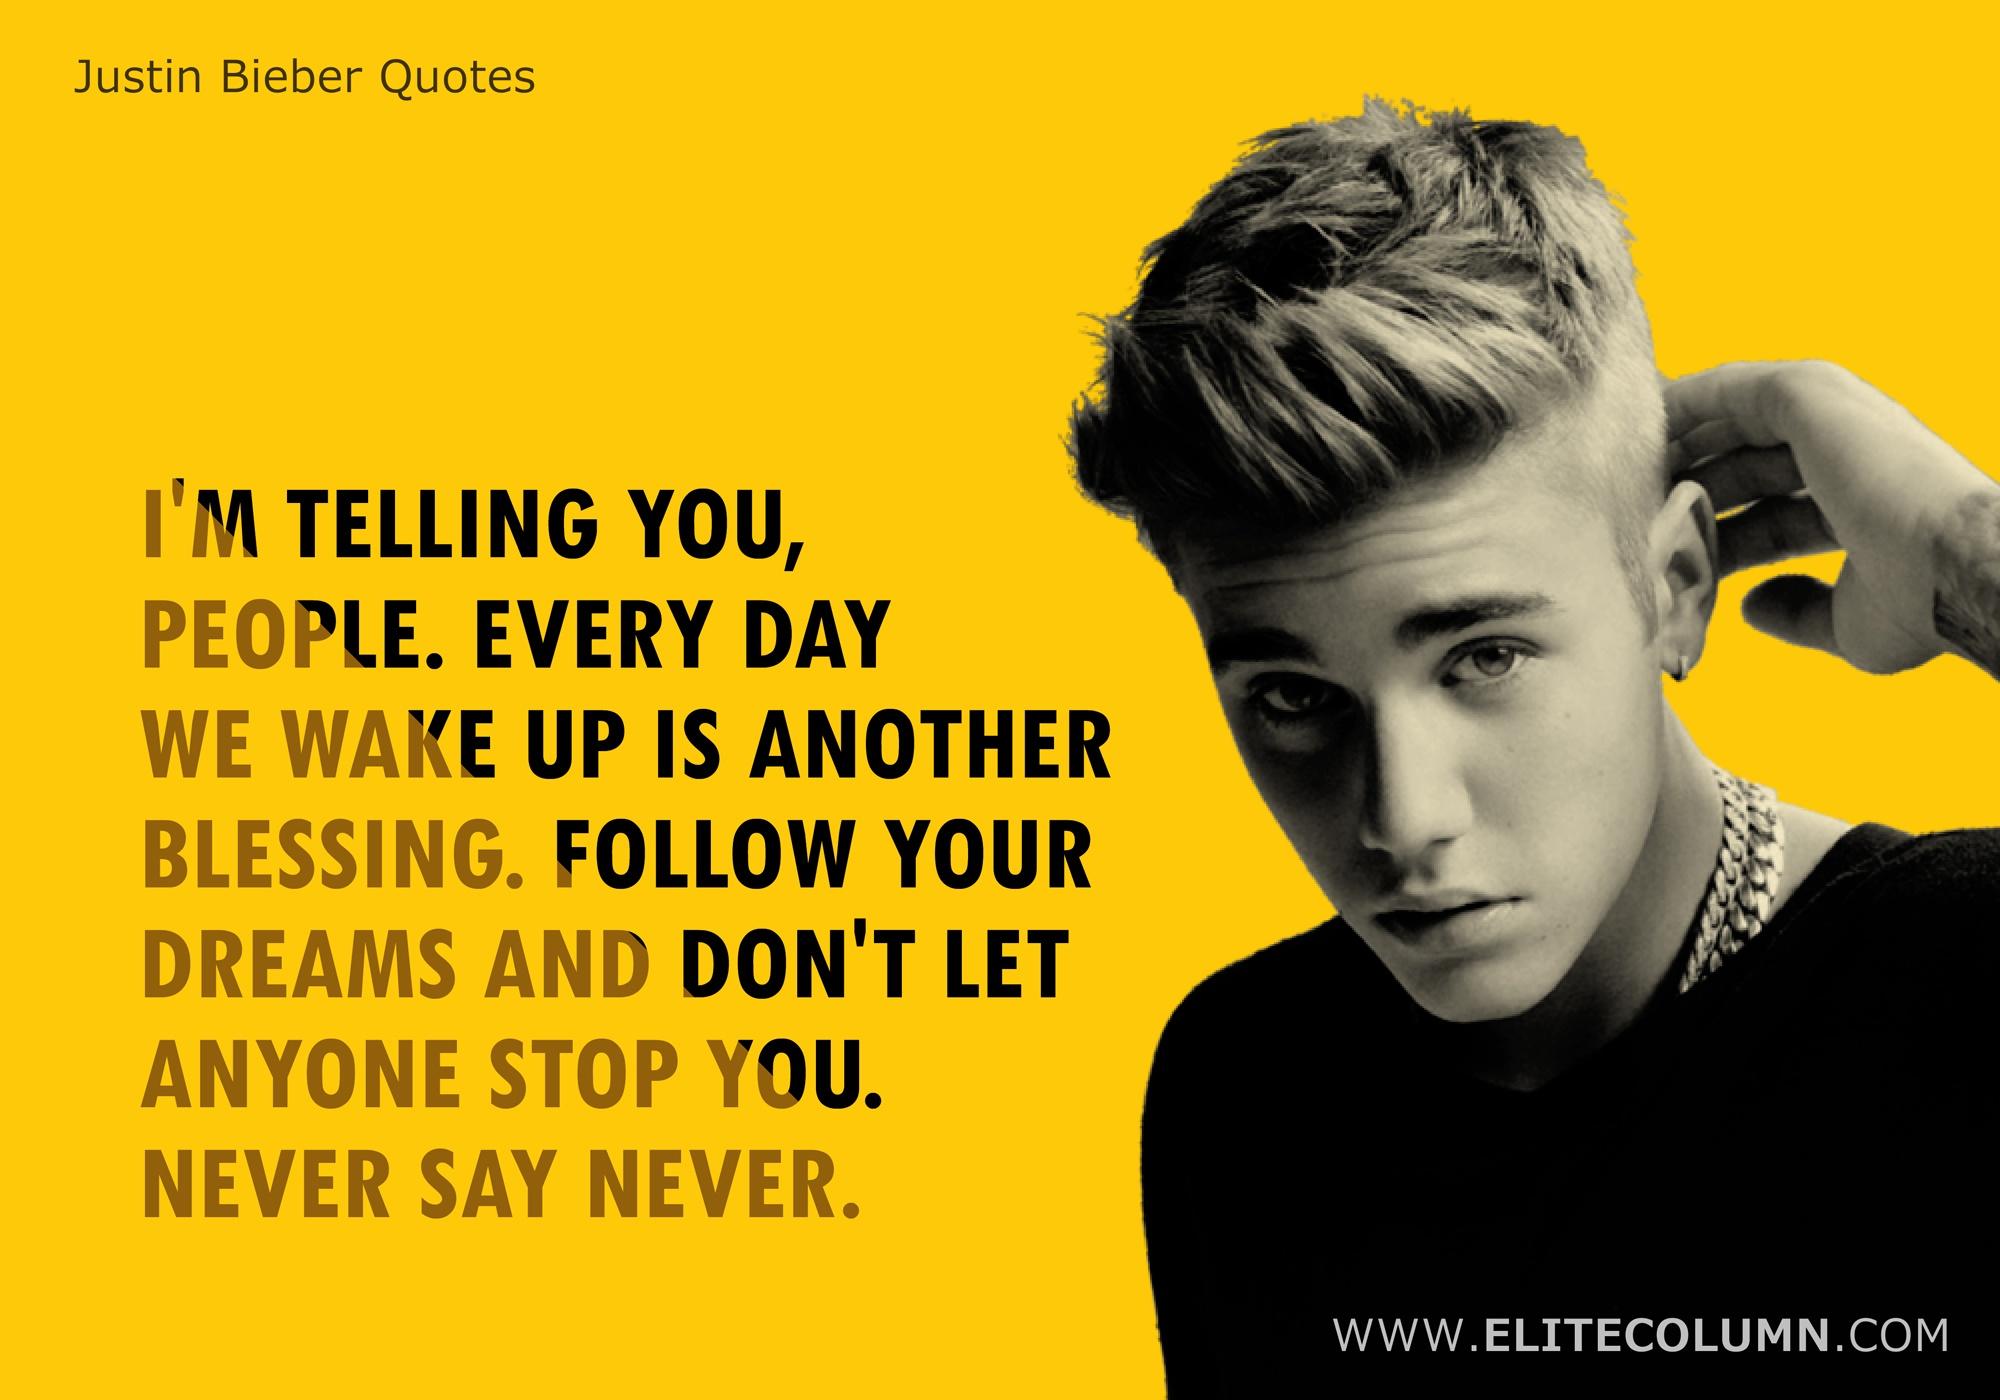 Justin Bieber Quotes (1)